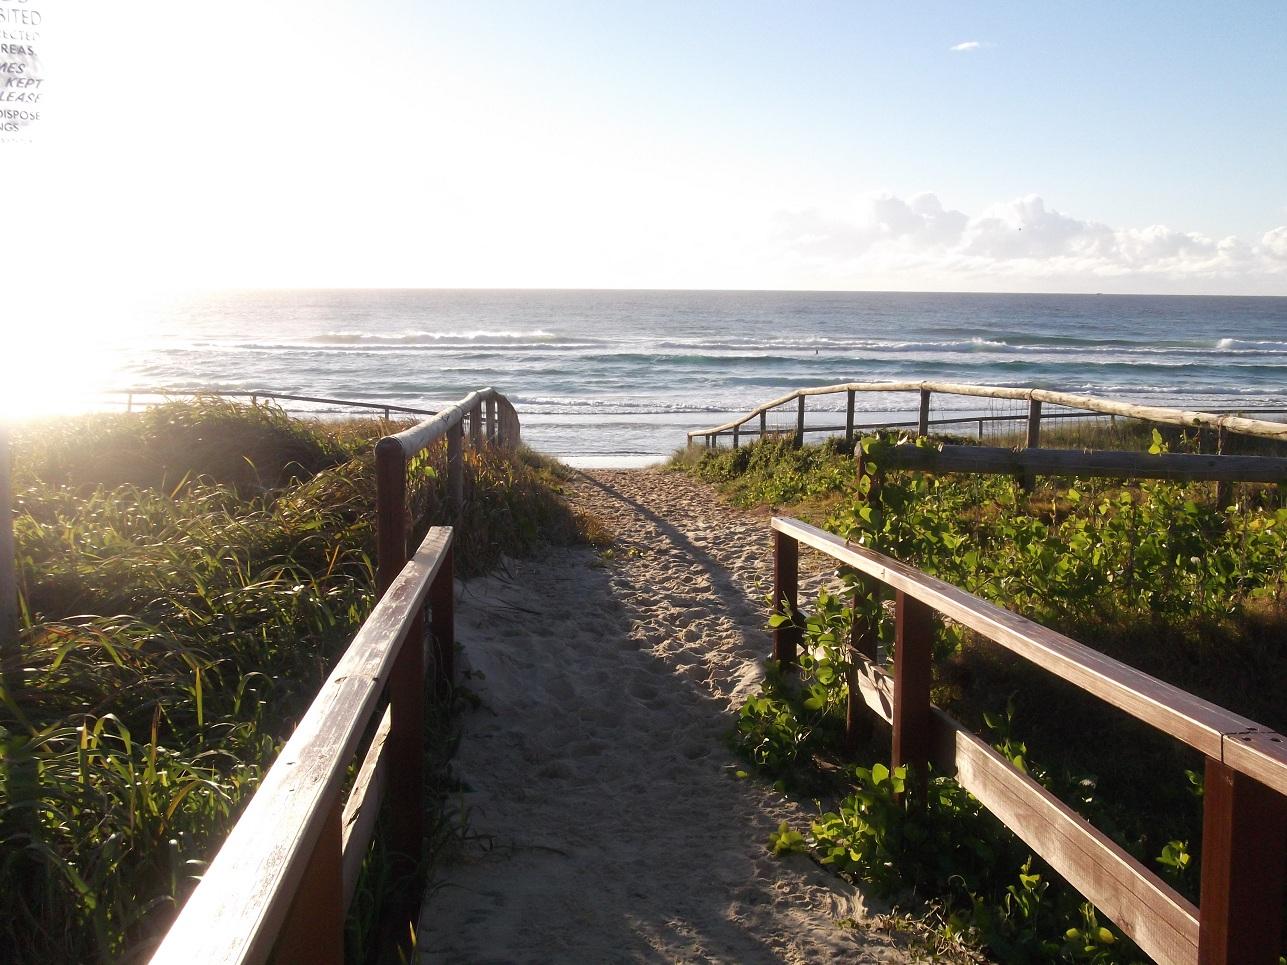 Entrance to Mermaid Beach, Queensland